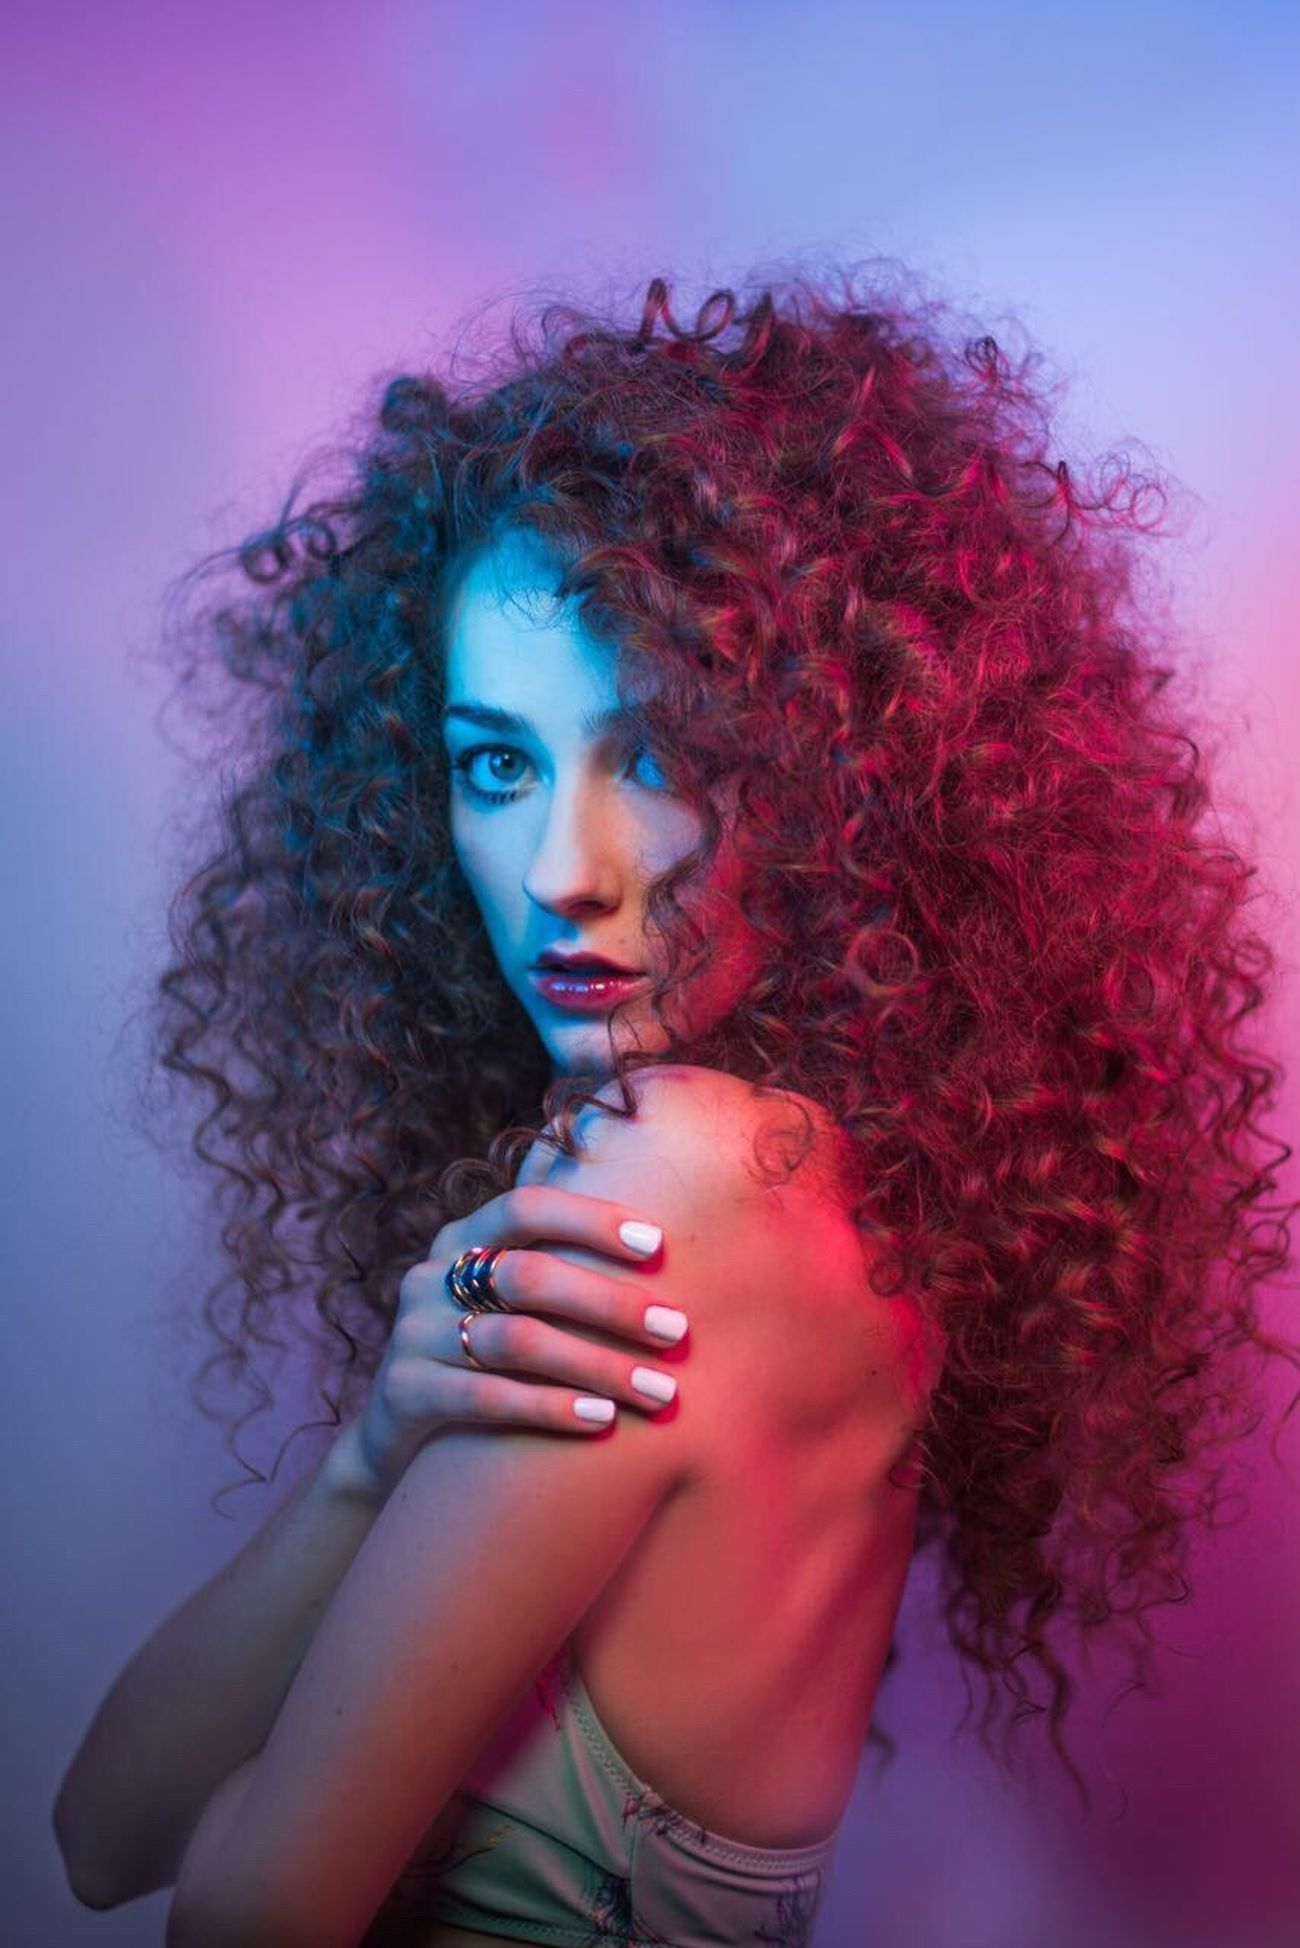 Beauty Model Neon Colourpop Odetograce Studio Studio Shot This Week On Eyeem TheWeek On EyEem